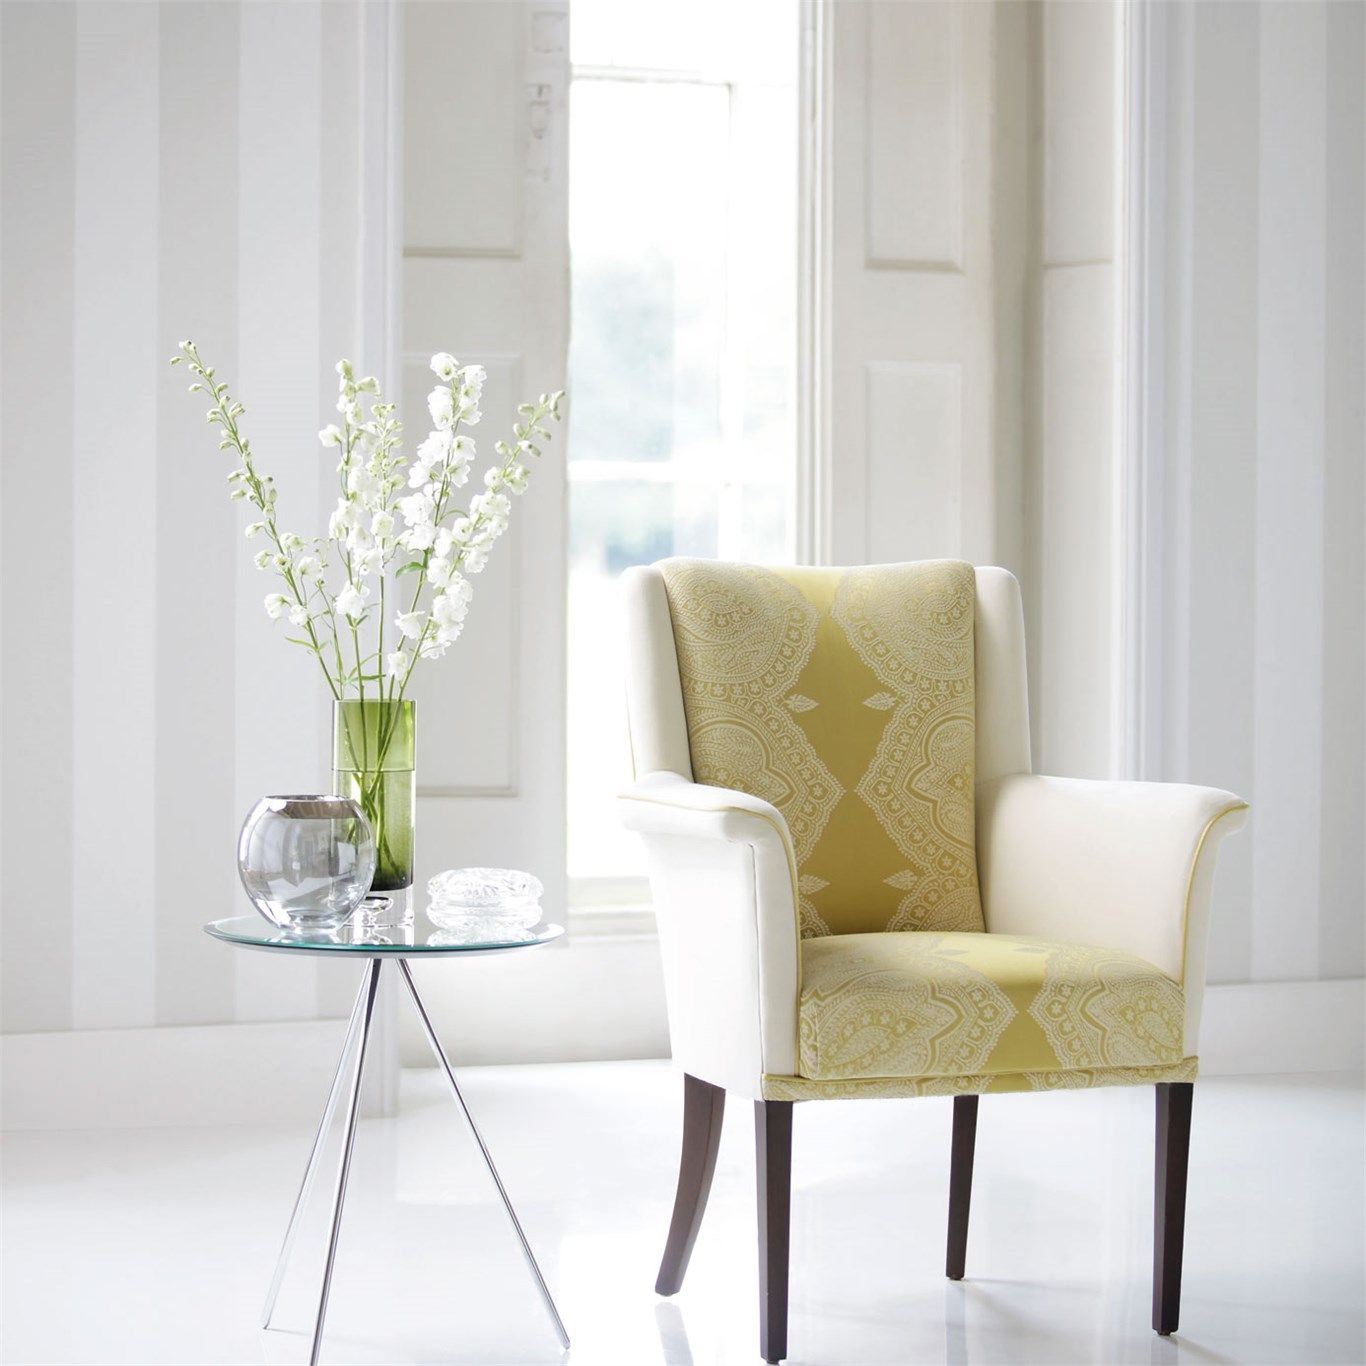 Harlequin - Designer Fabrics And Wallpapers